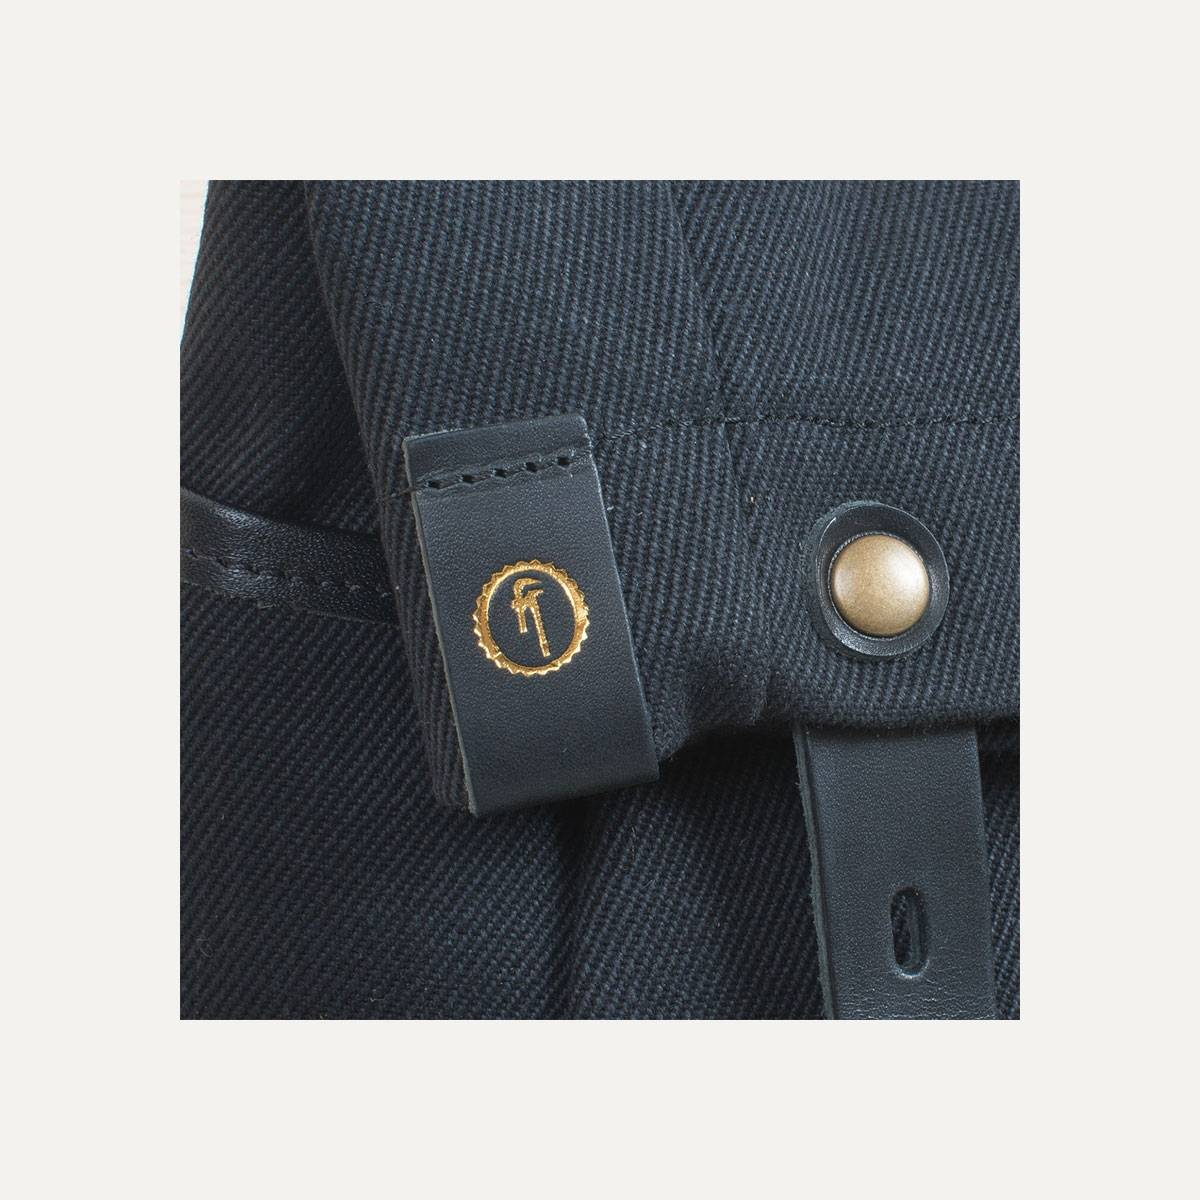 Gibus tool bag - Black (image n°4)